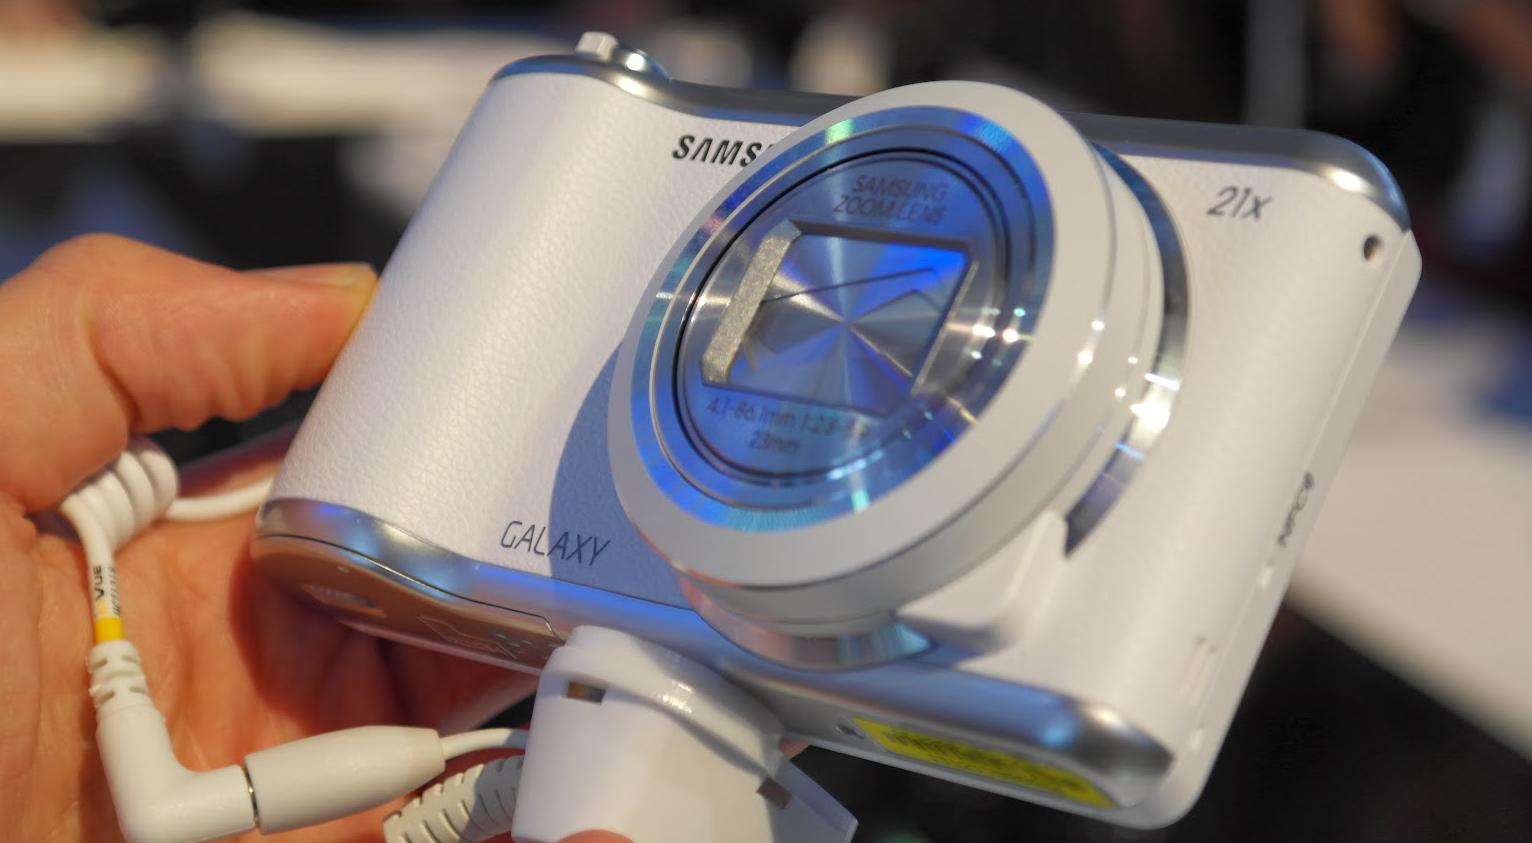 Samsung lansează Galaxy Camera 2 -1- ilovesamsung